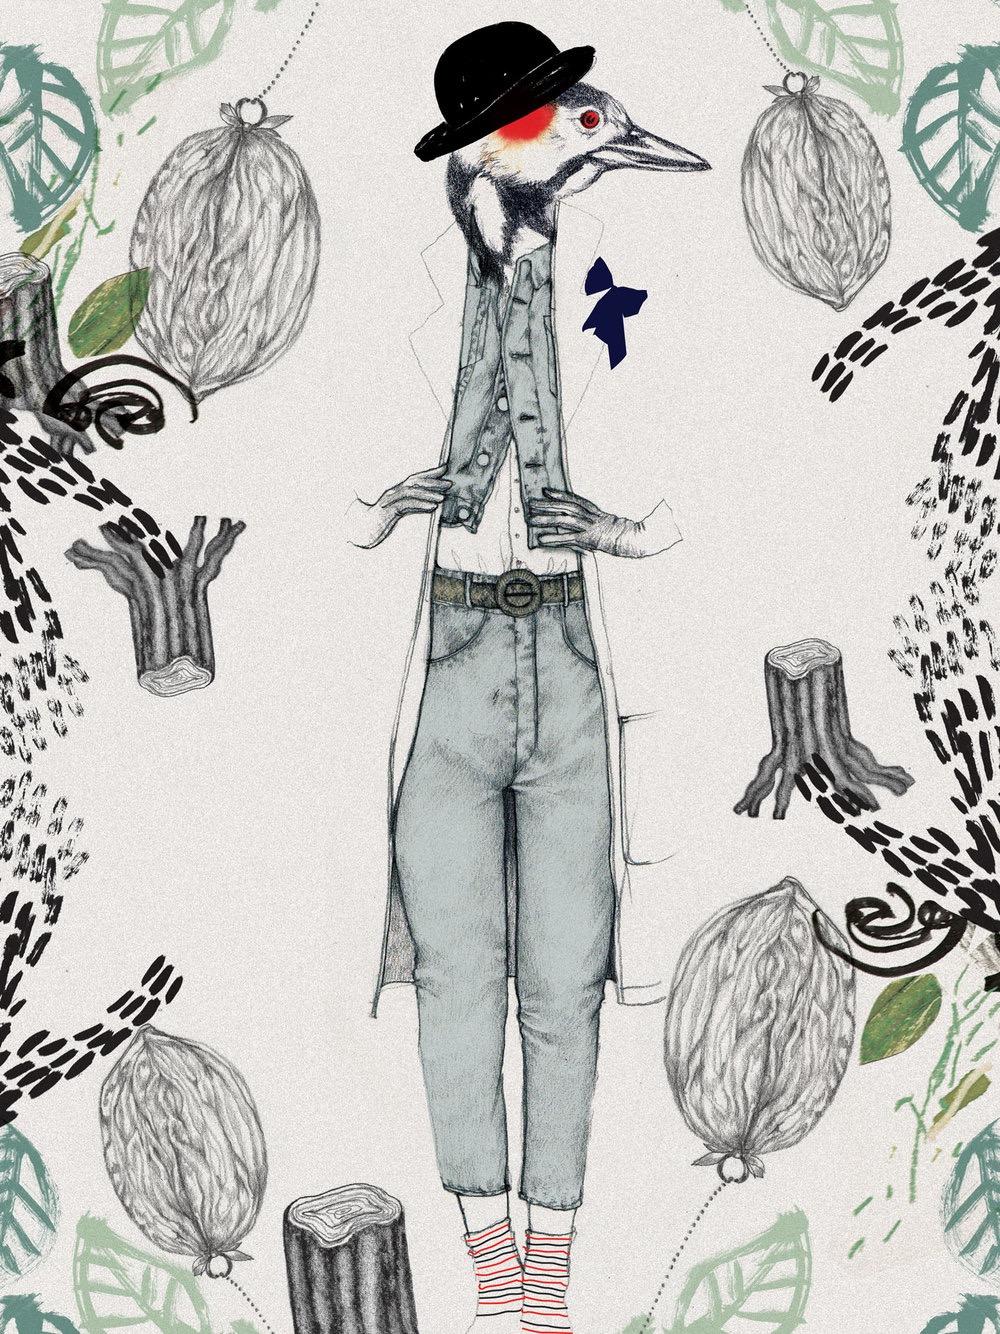 illustrator, illustrators, illustration, illustrations, leaf, leaves, print, stamp, tree trunk, bird, birds, walnut, walnuts, suit, suits, retro, hat, stippling